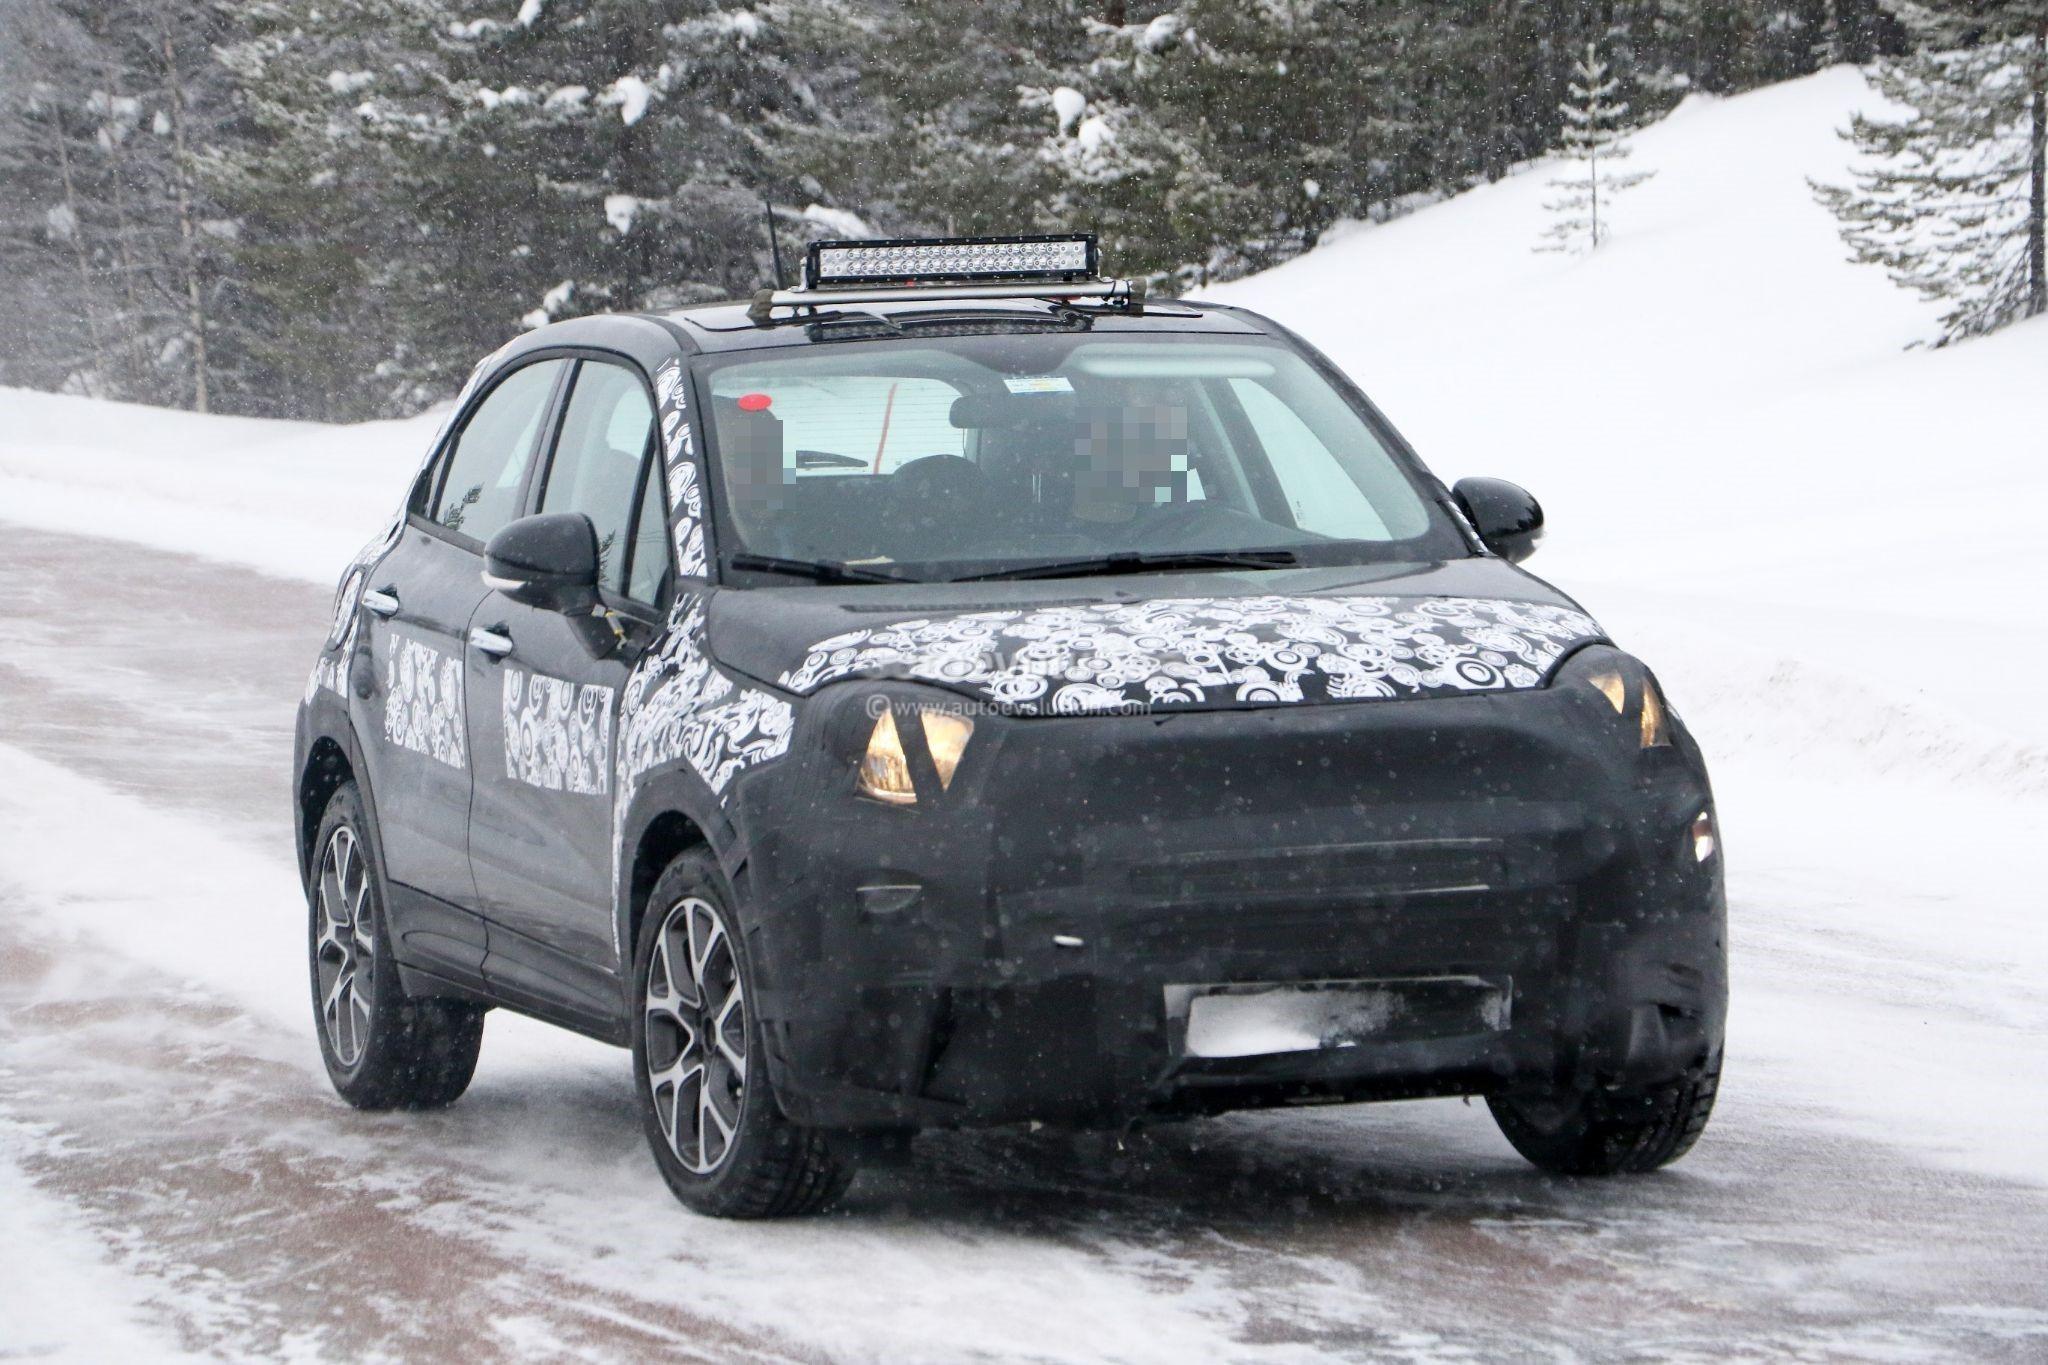 Viagra In Fuel Tank Makes The New Fiat 500x Bigger In